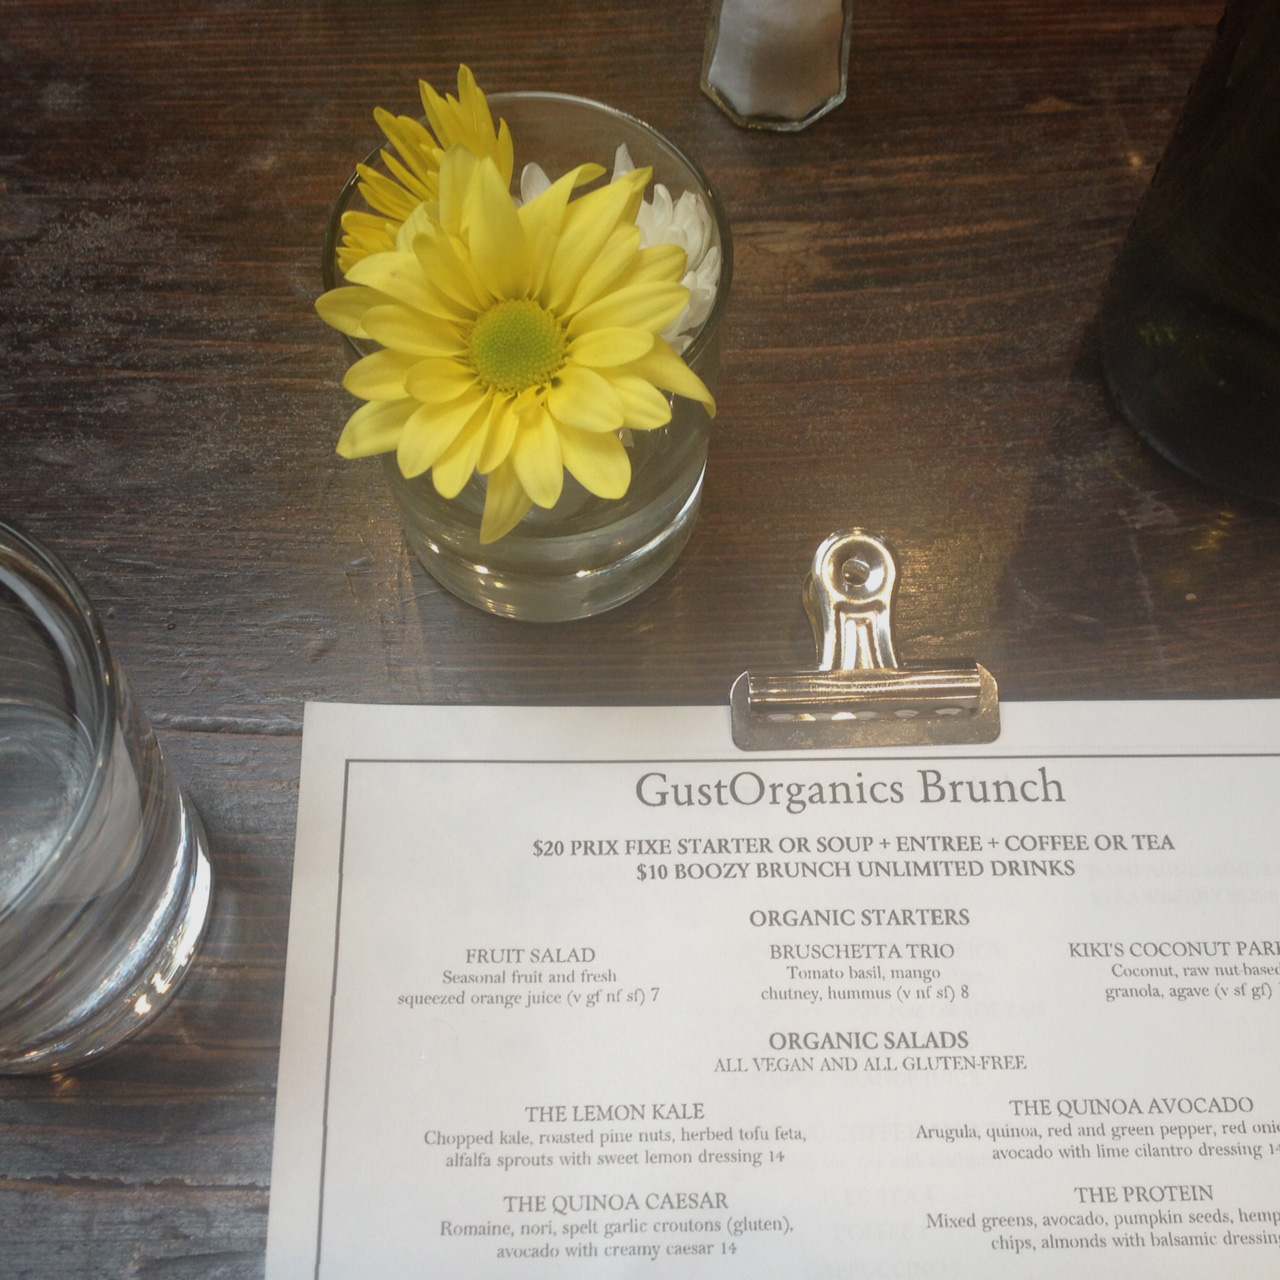 Gust Organics, West Village